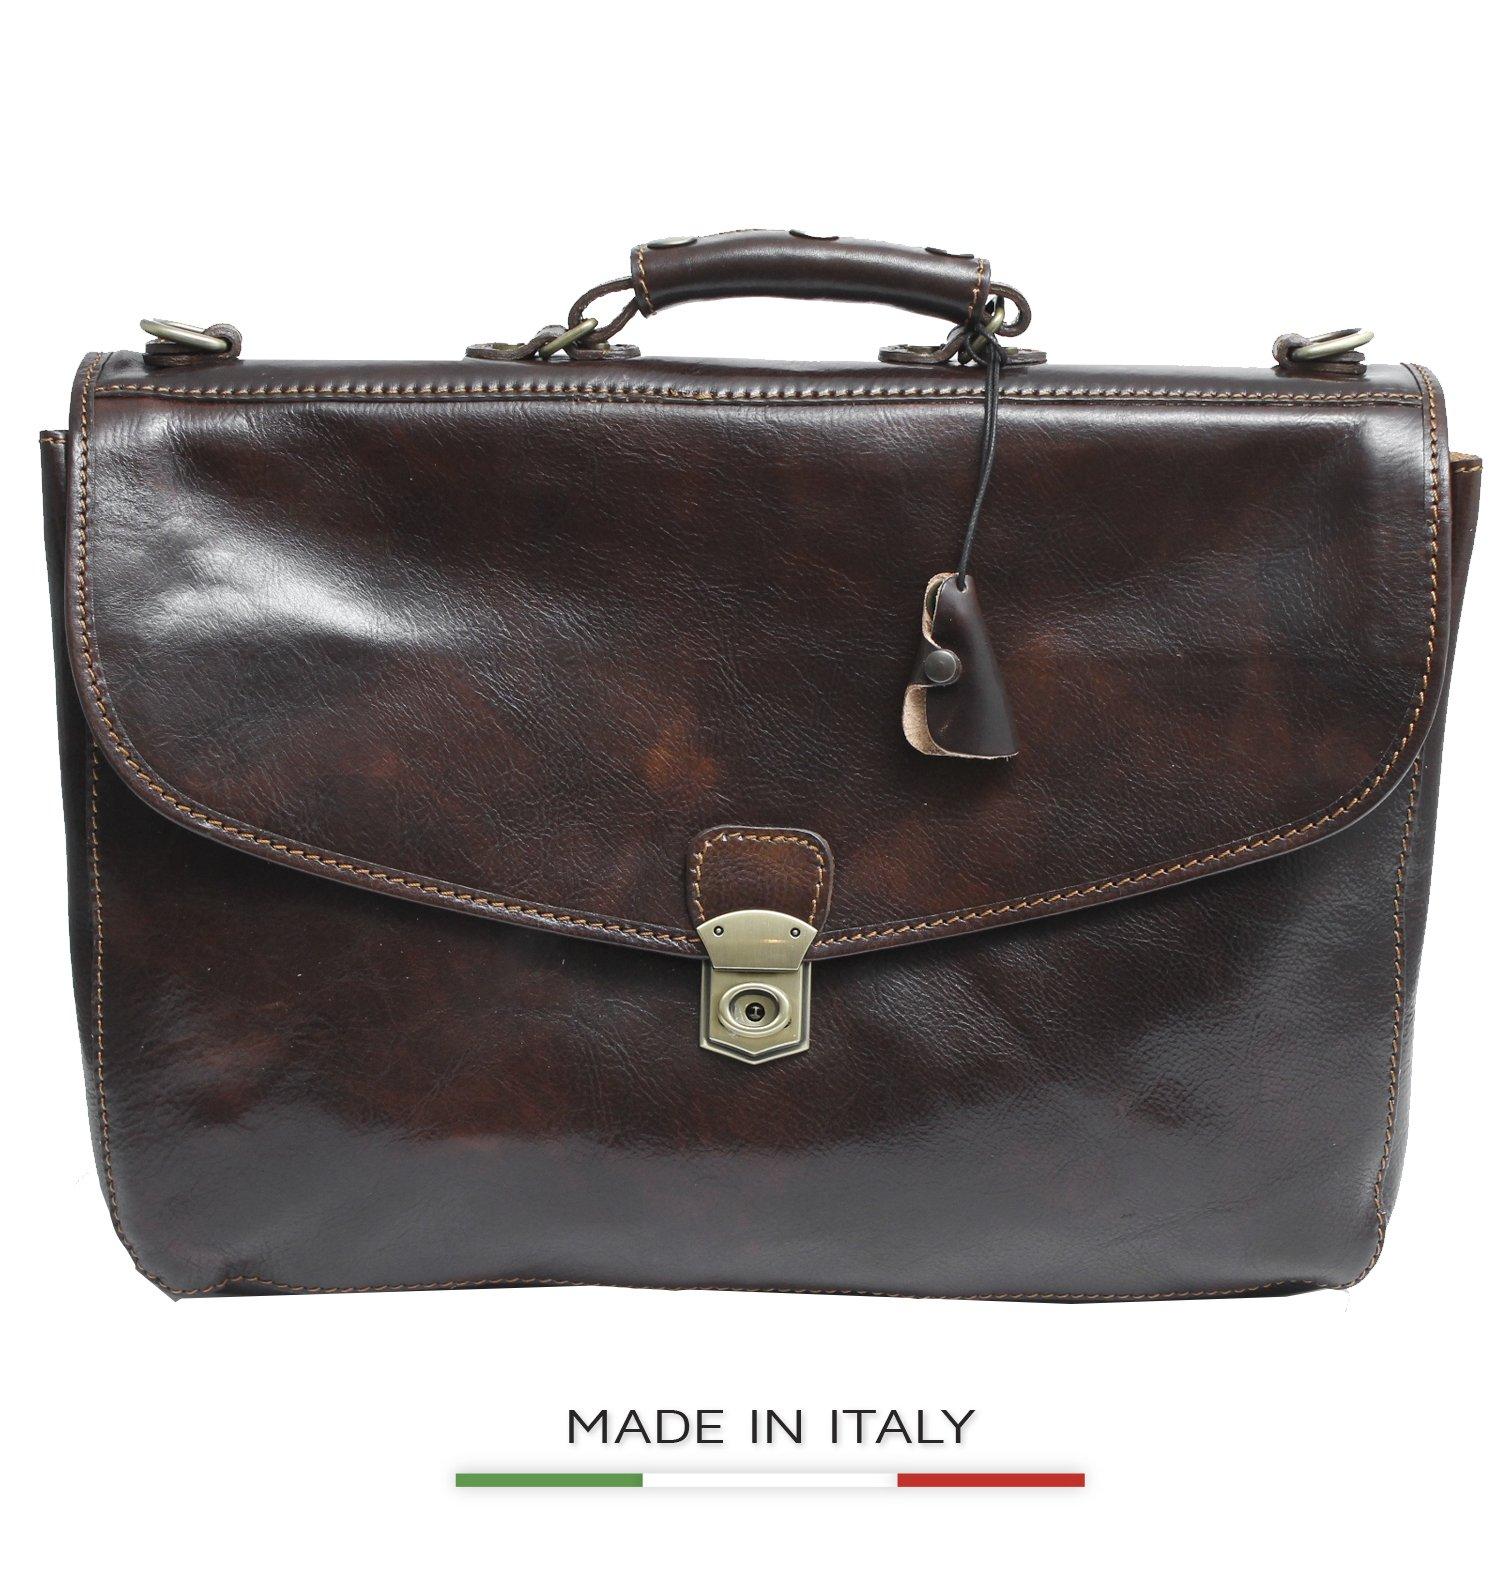 Luggage Depot USA, LLC Alberto Bellucci Italian Leather Triple Compartment Messenger Briefcase, D. Brn Briefcase, Dark Brown